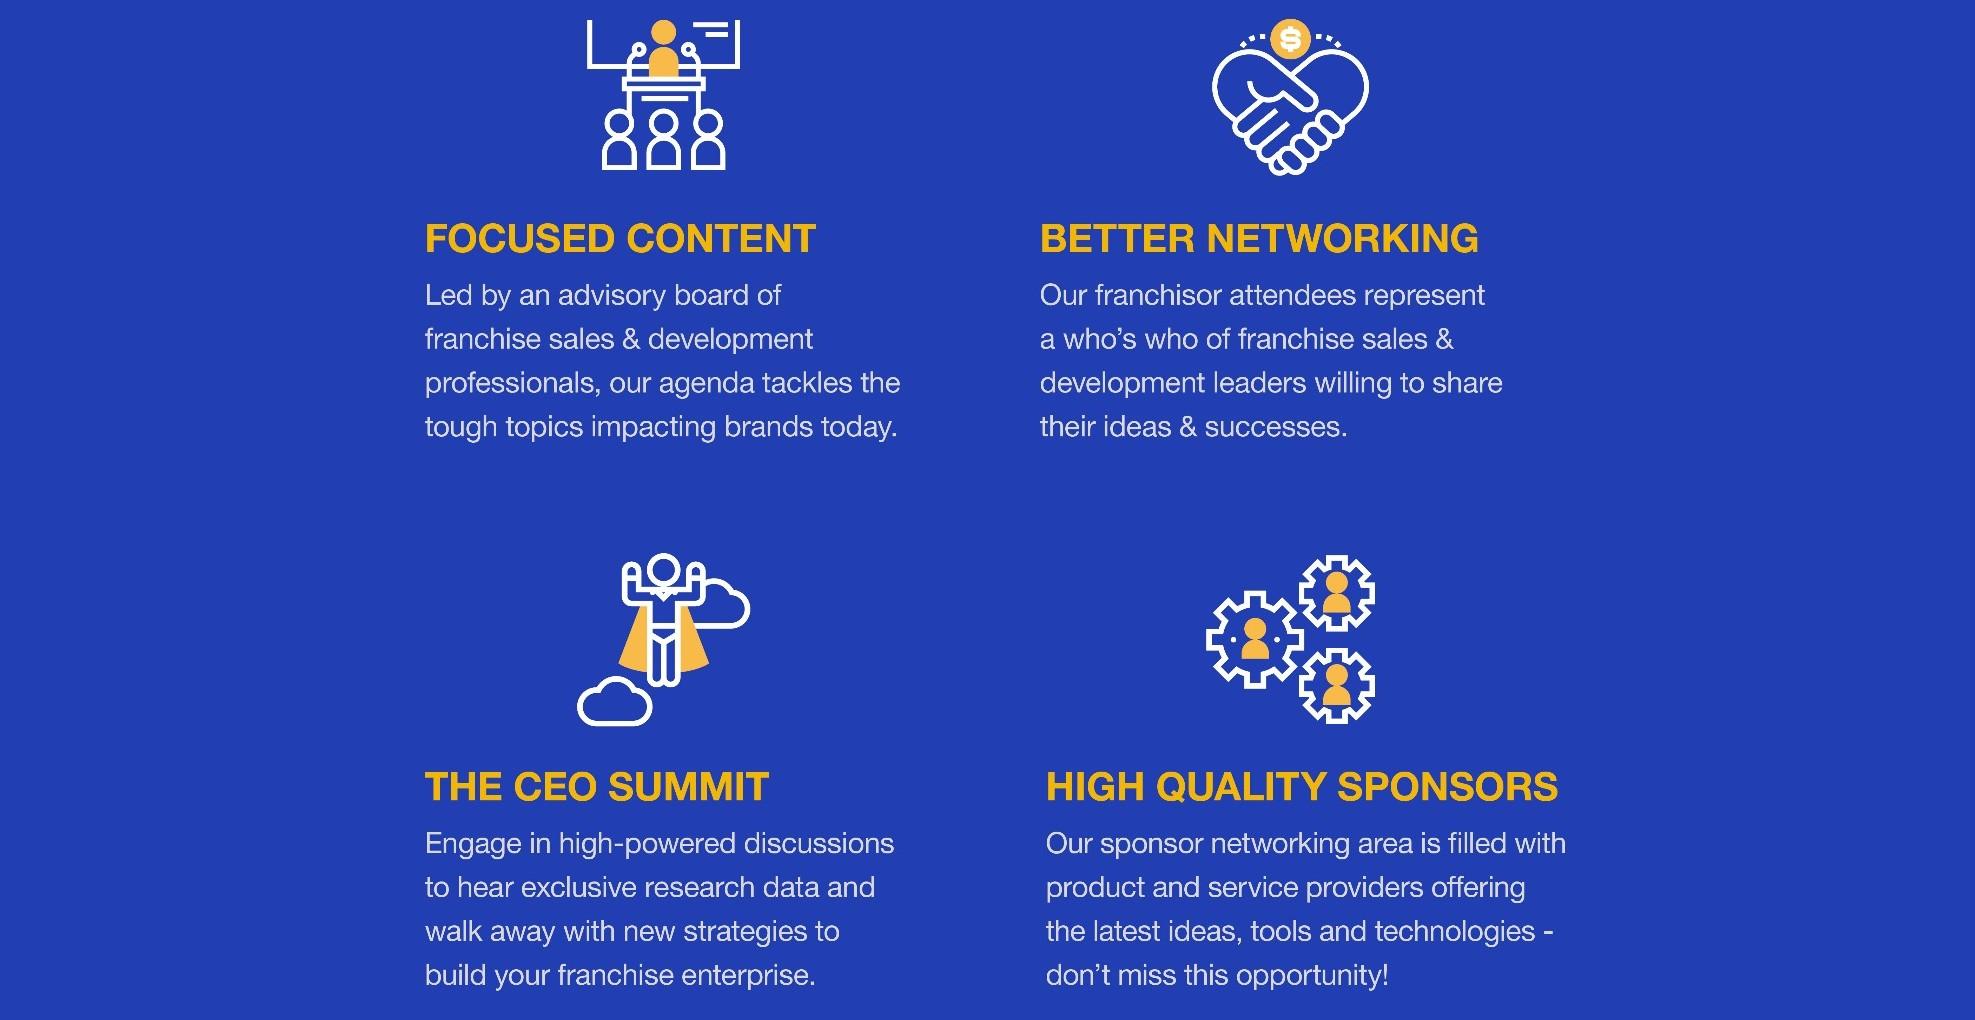 Home | 2018 Franchise Leadership & Development Conference